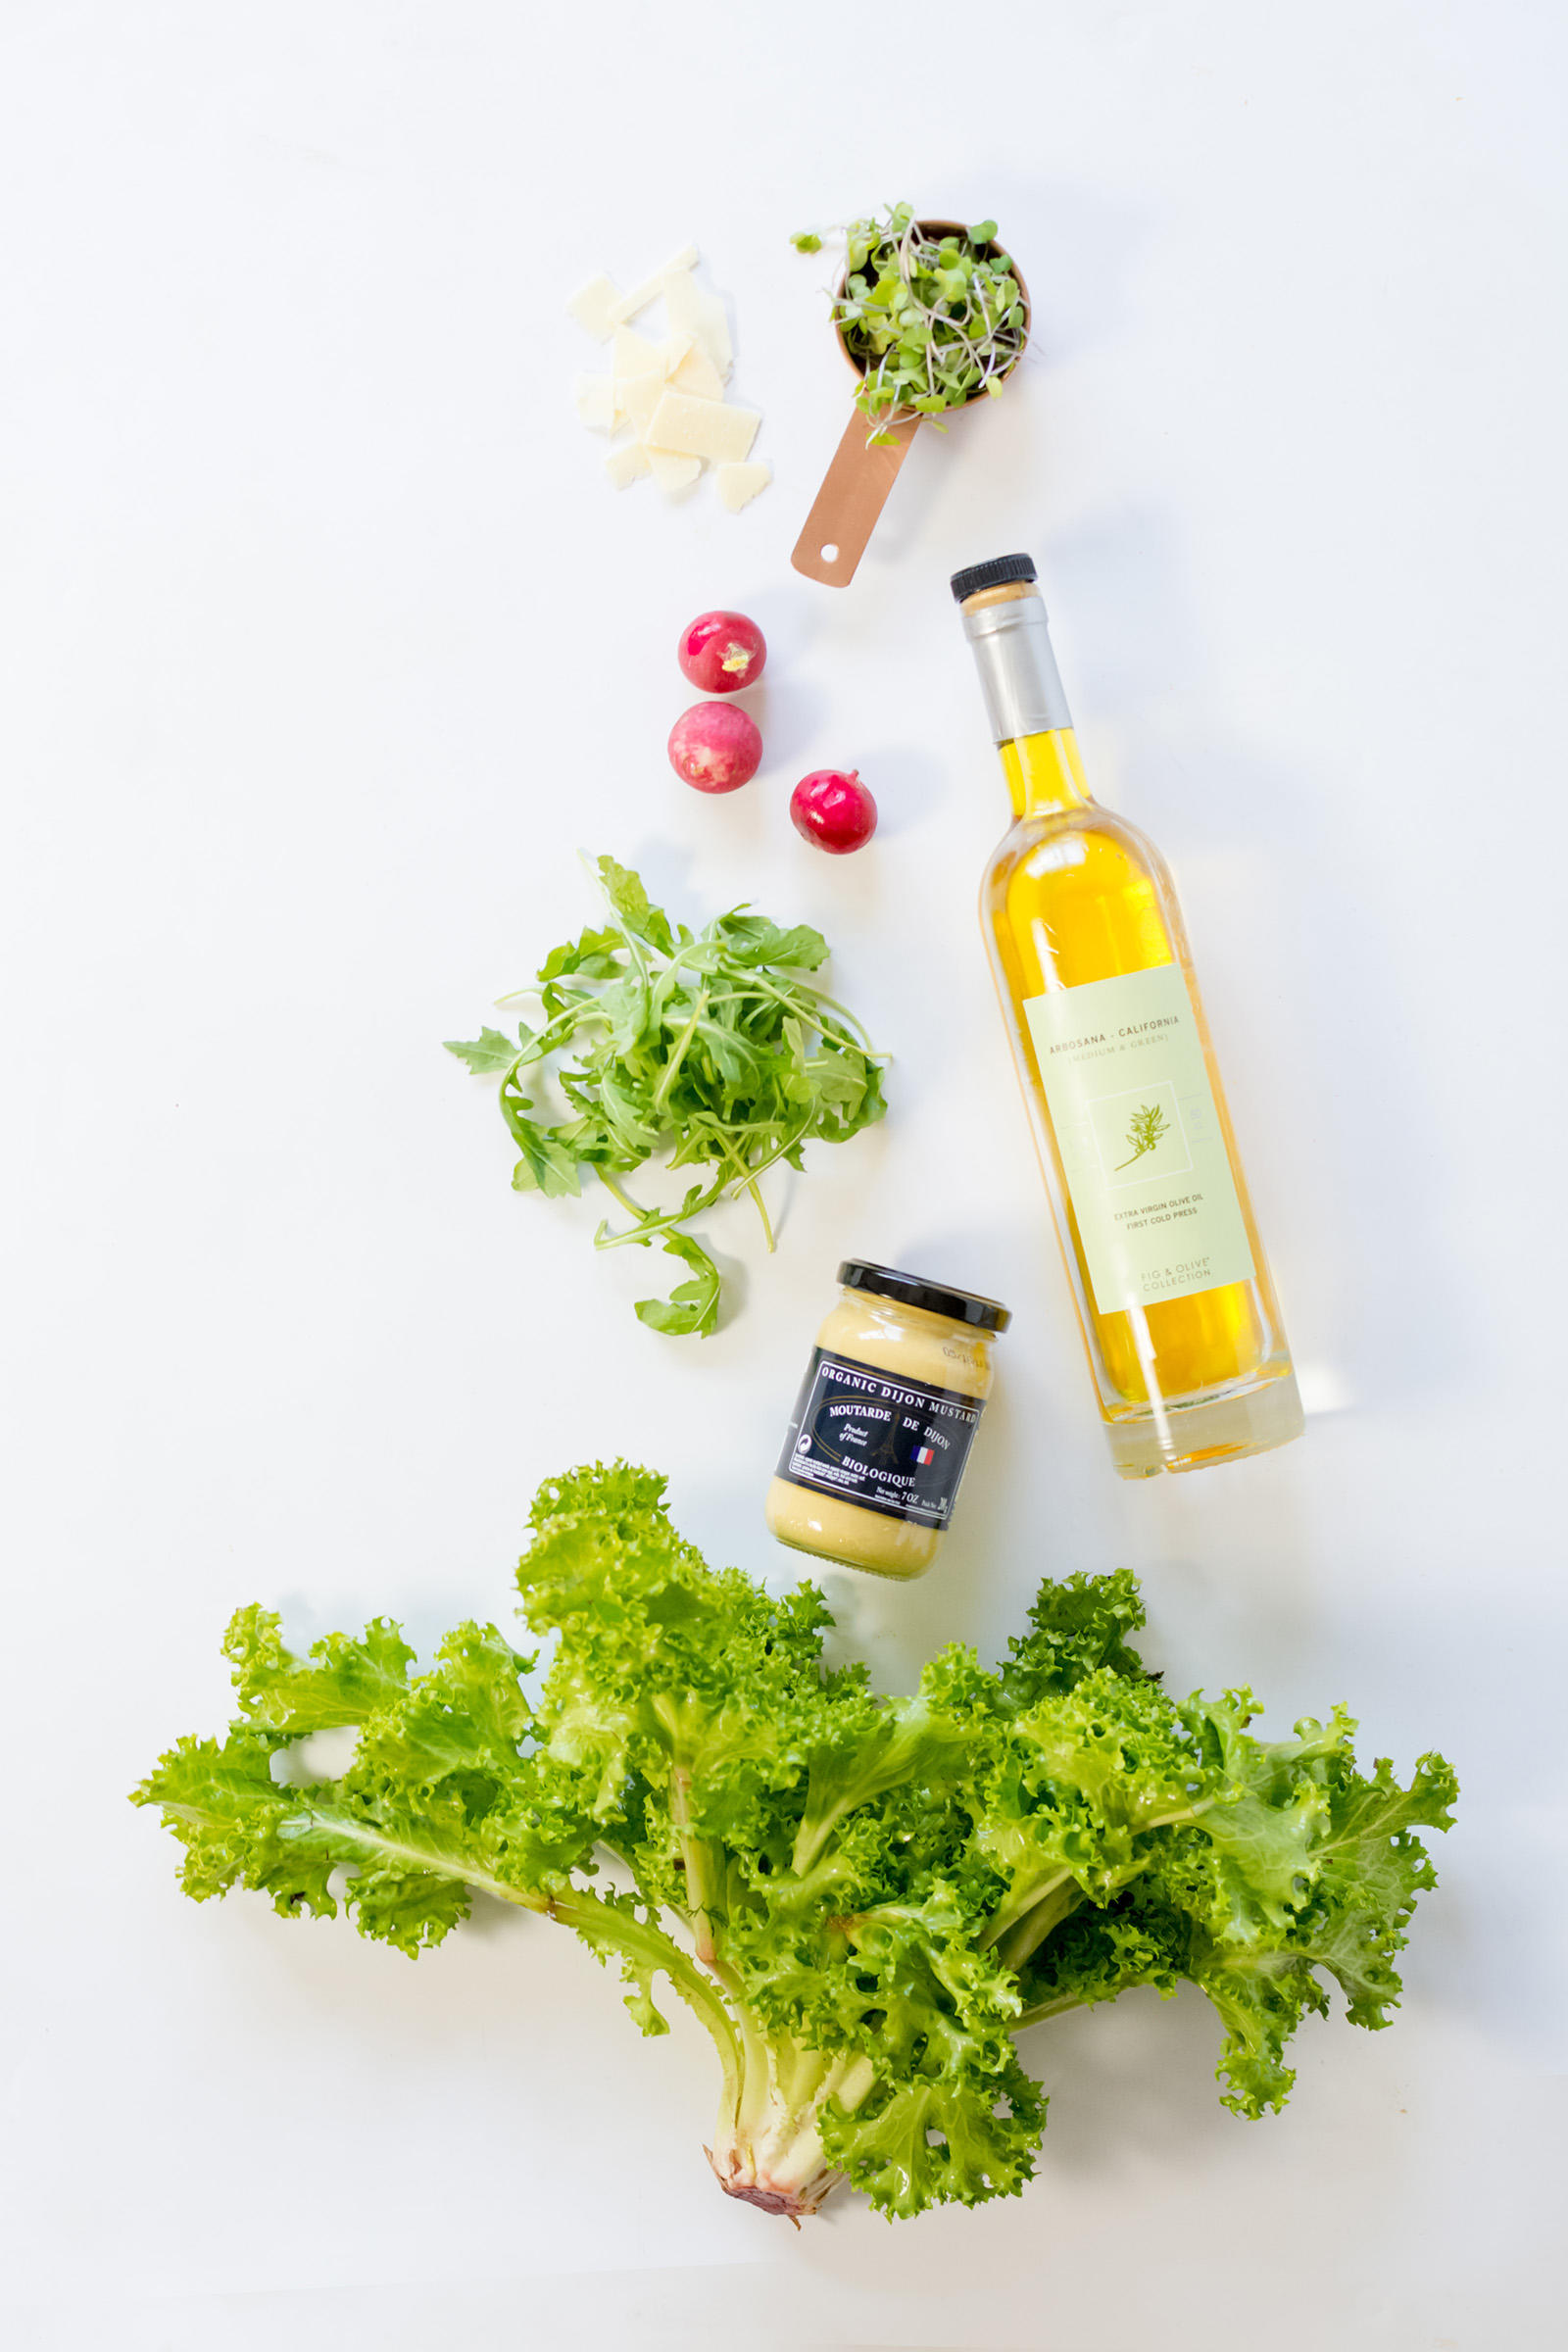 Simple French Dijon Dressing Recipe